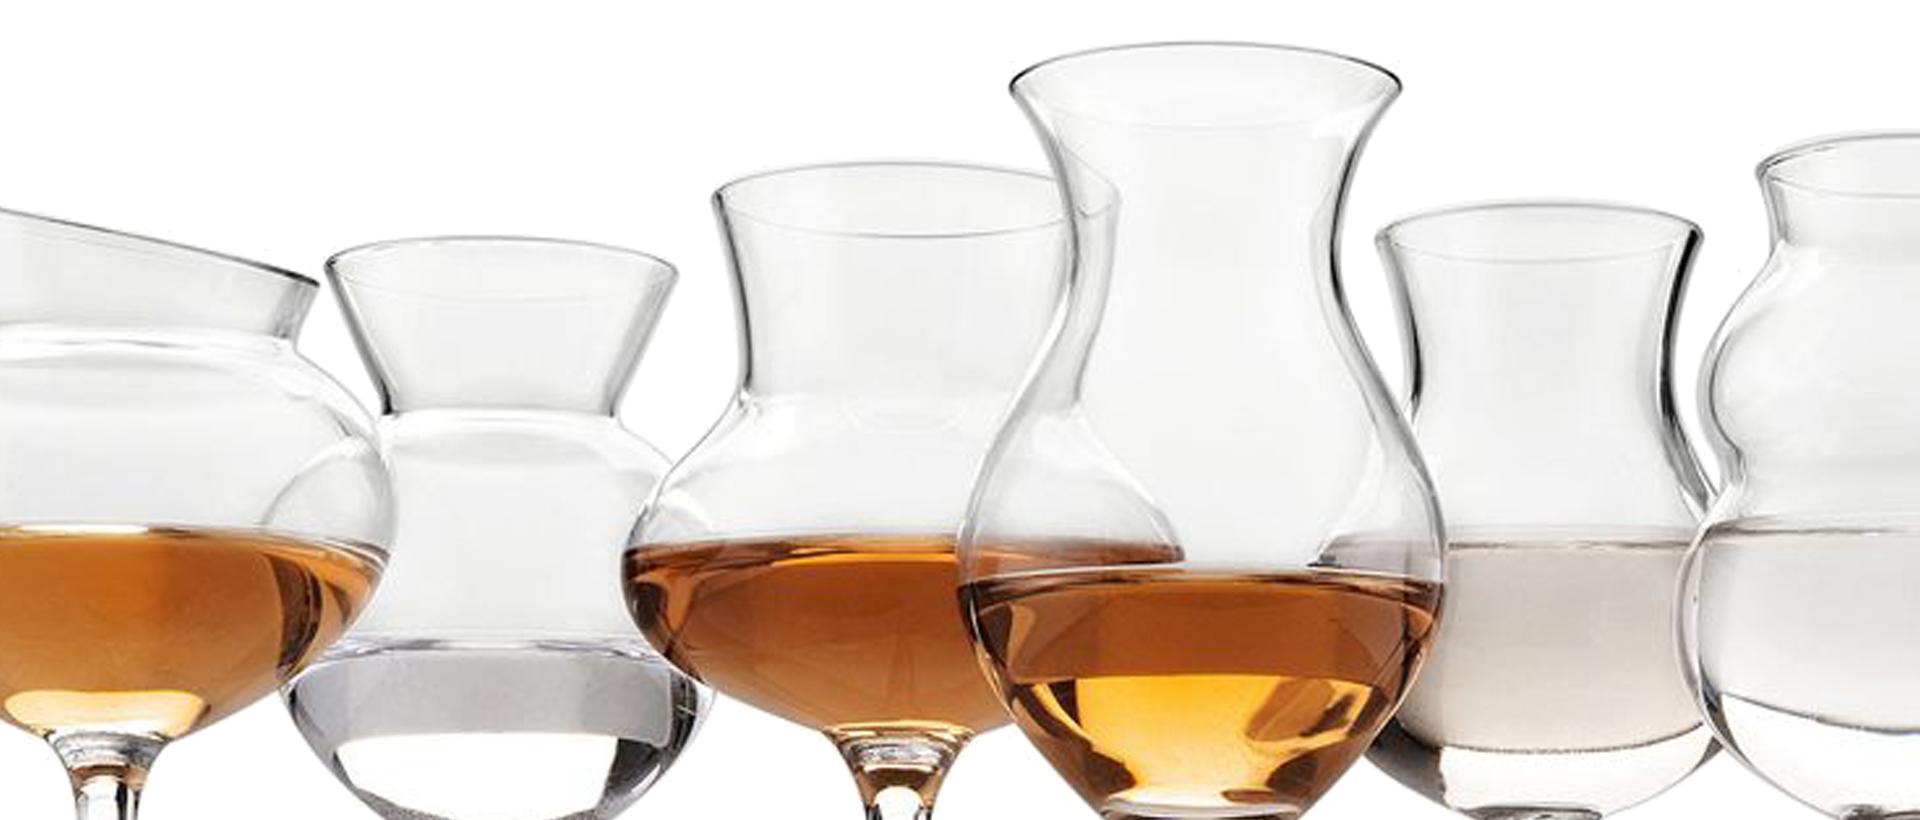 https://www.romabeercompany.it/wp-content/uploads/2019/07/distillati-750x400.png